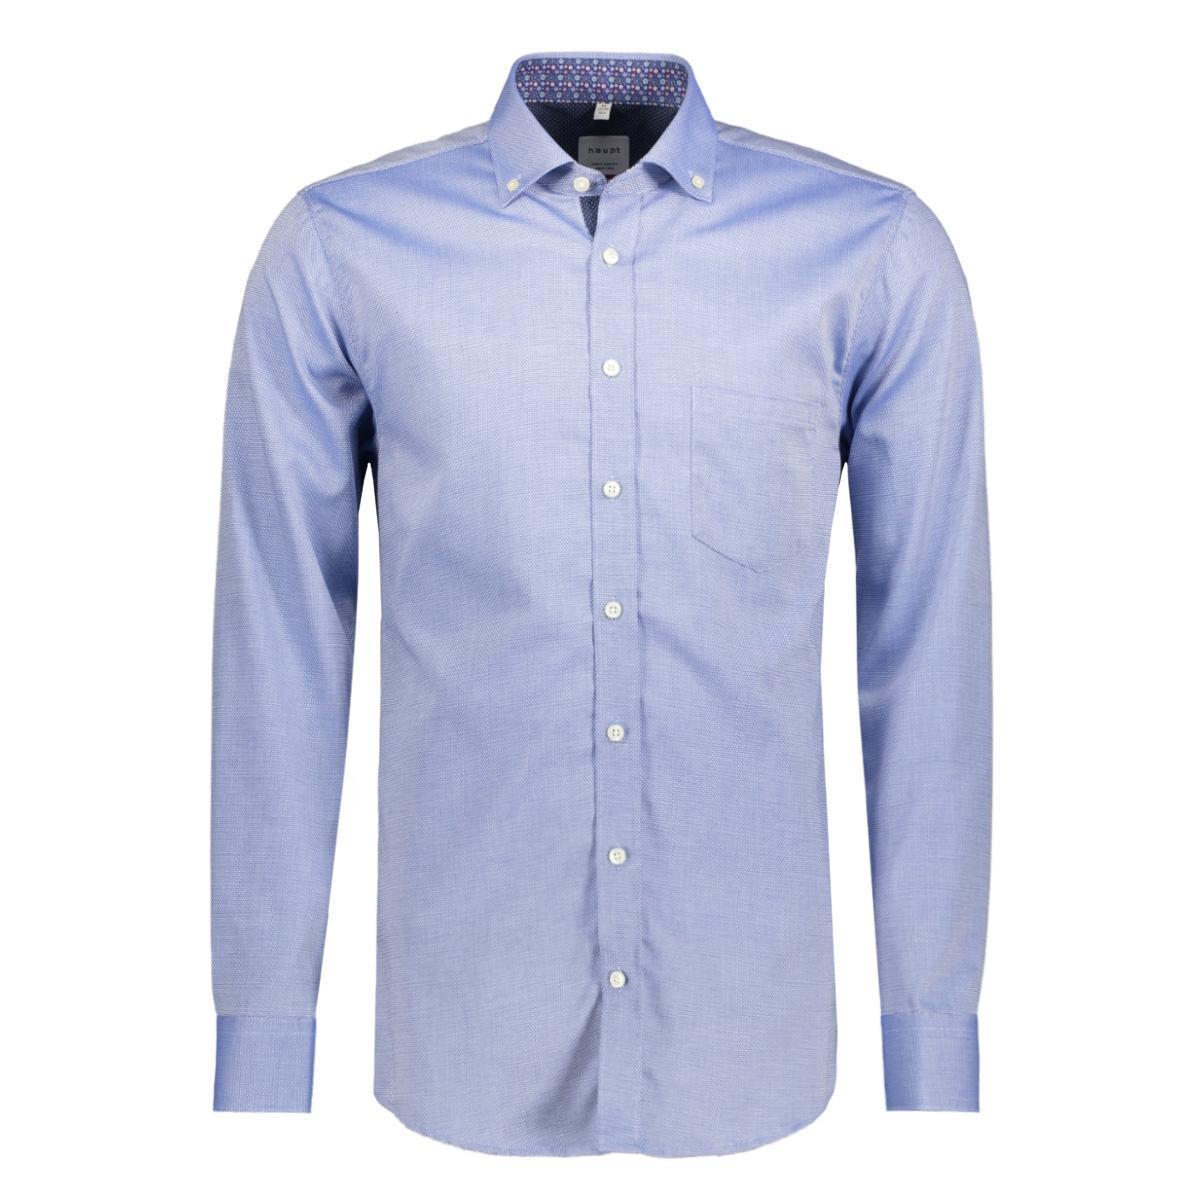 3060 7067 haupt overhemd 02